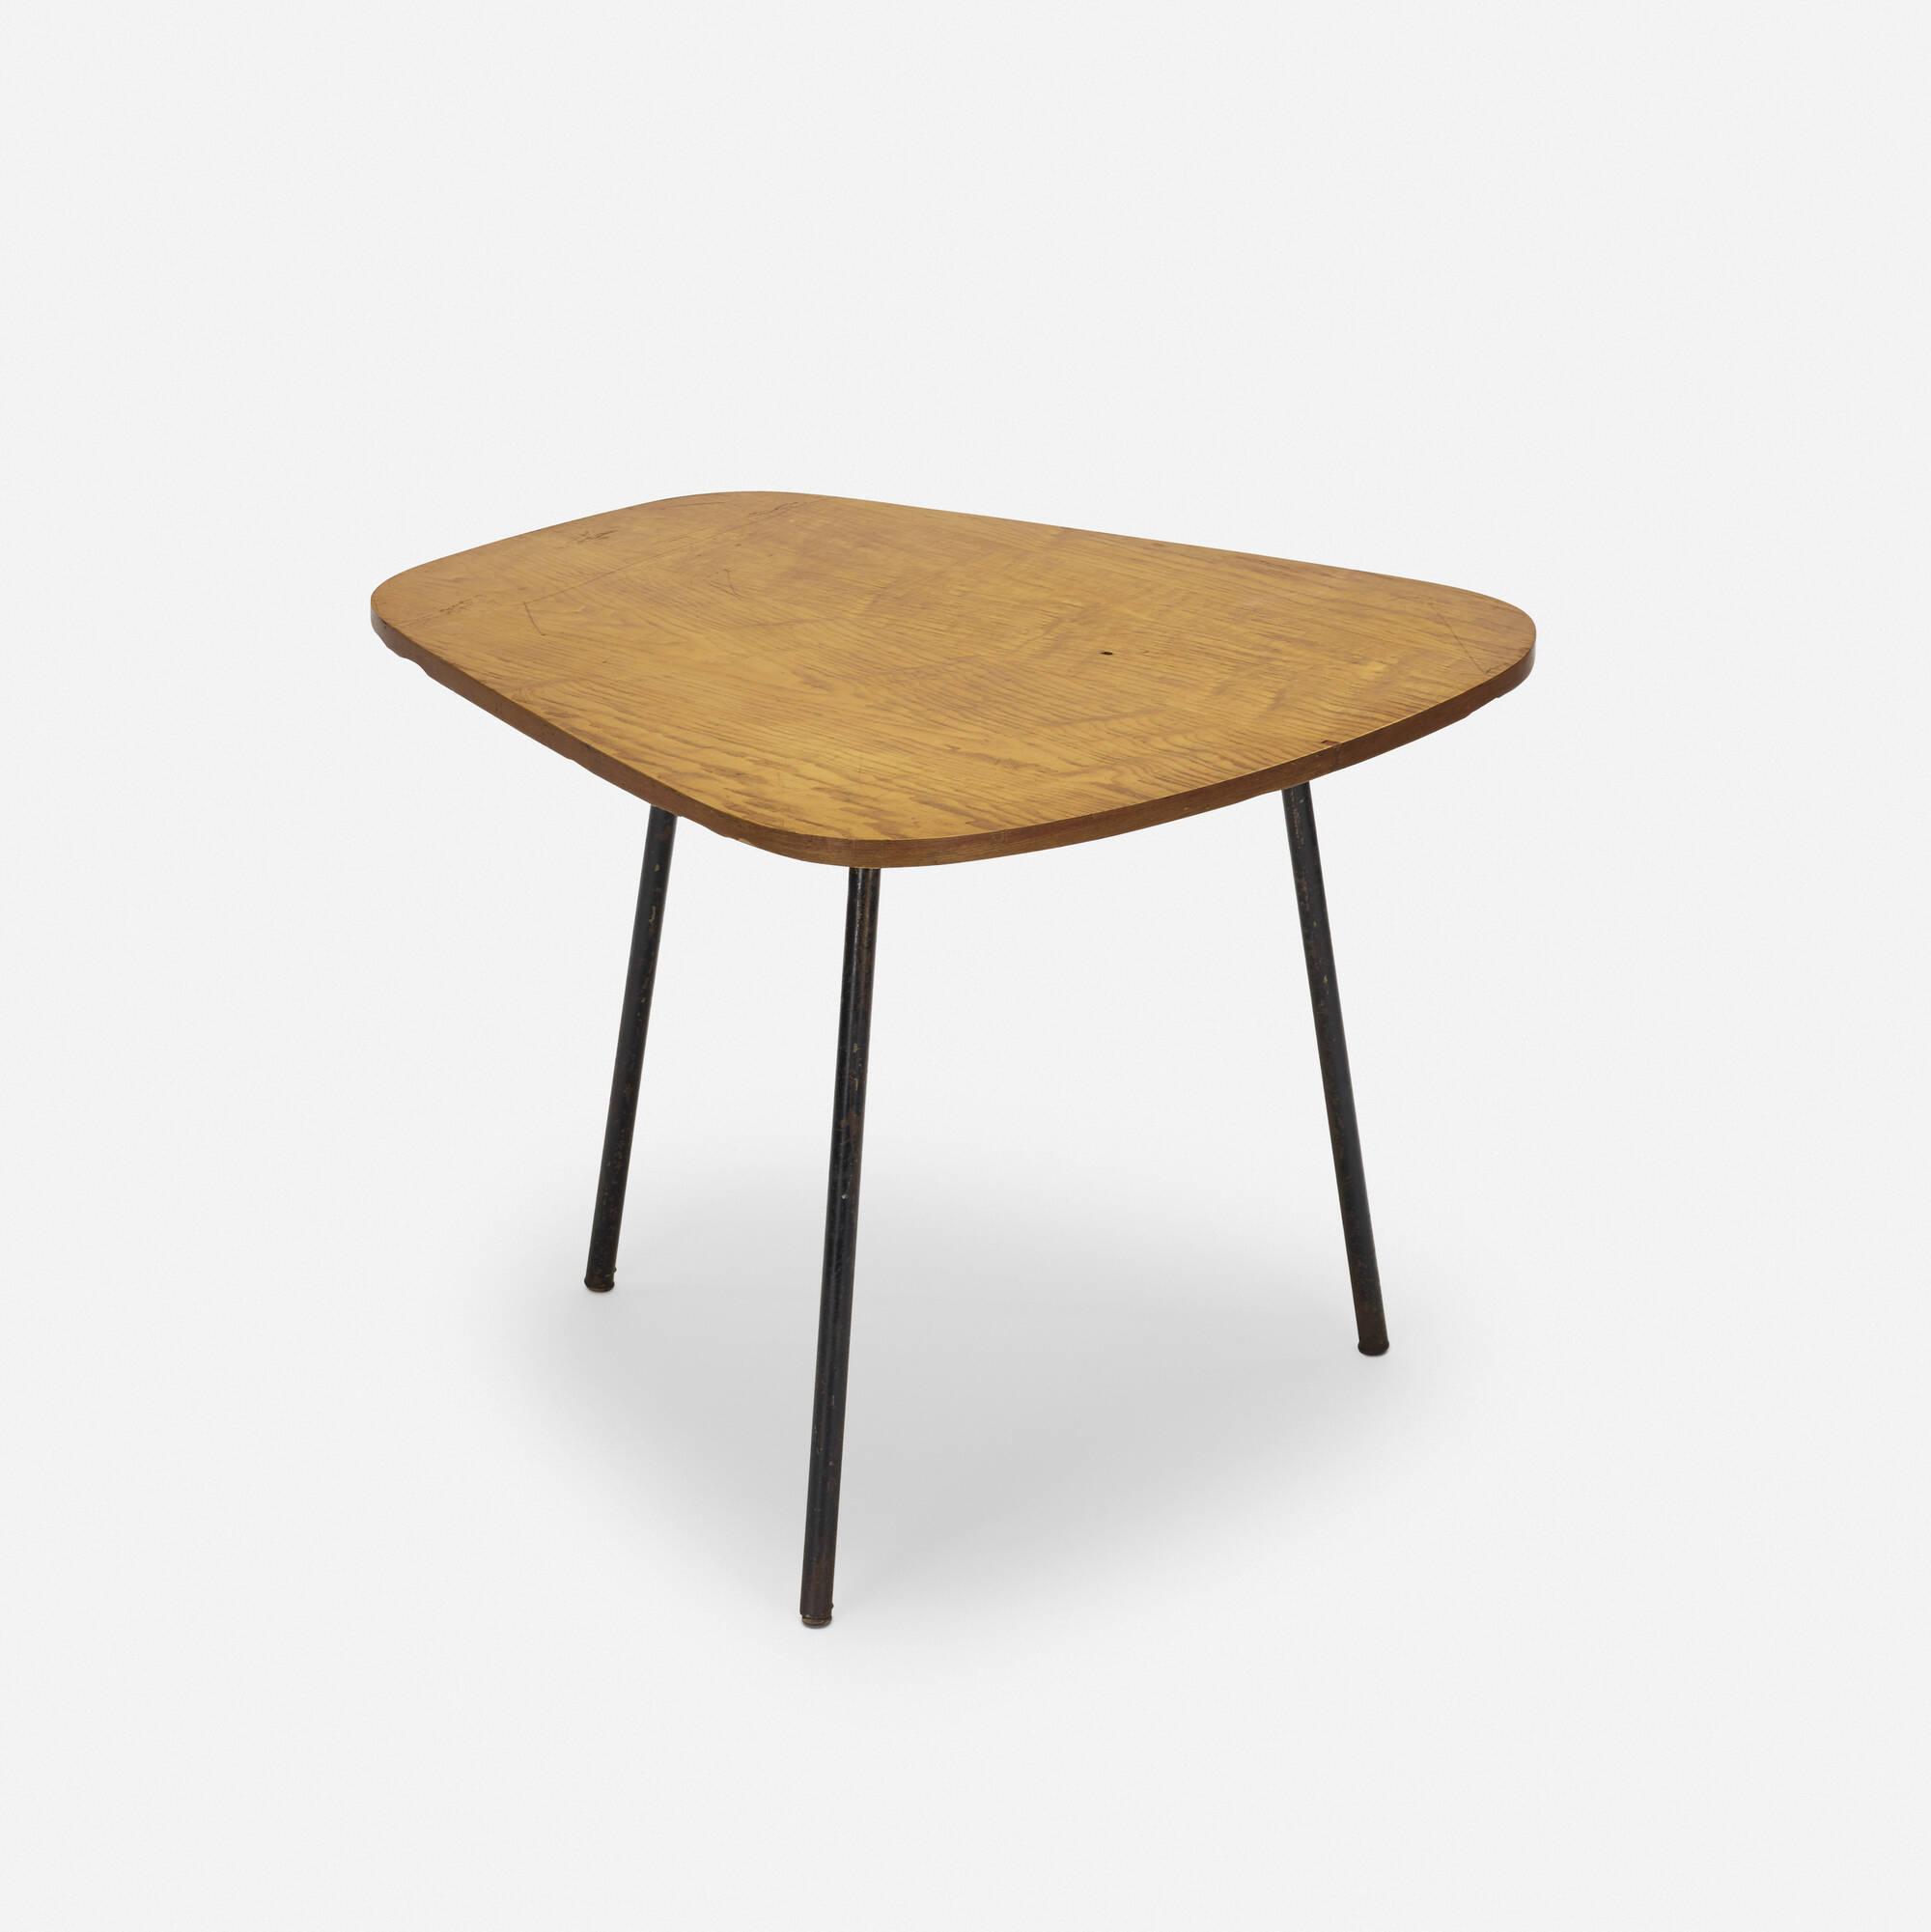 187 charlotte perriand rare table from maison de la tunisie cité internationale universitaire